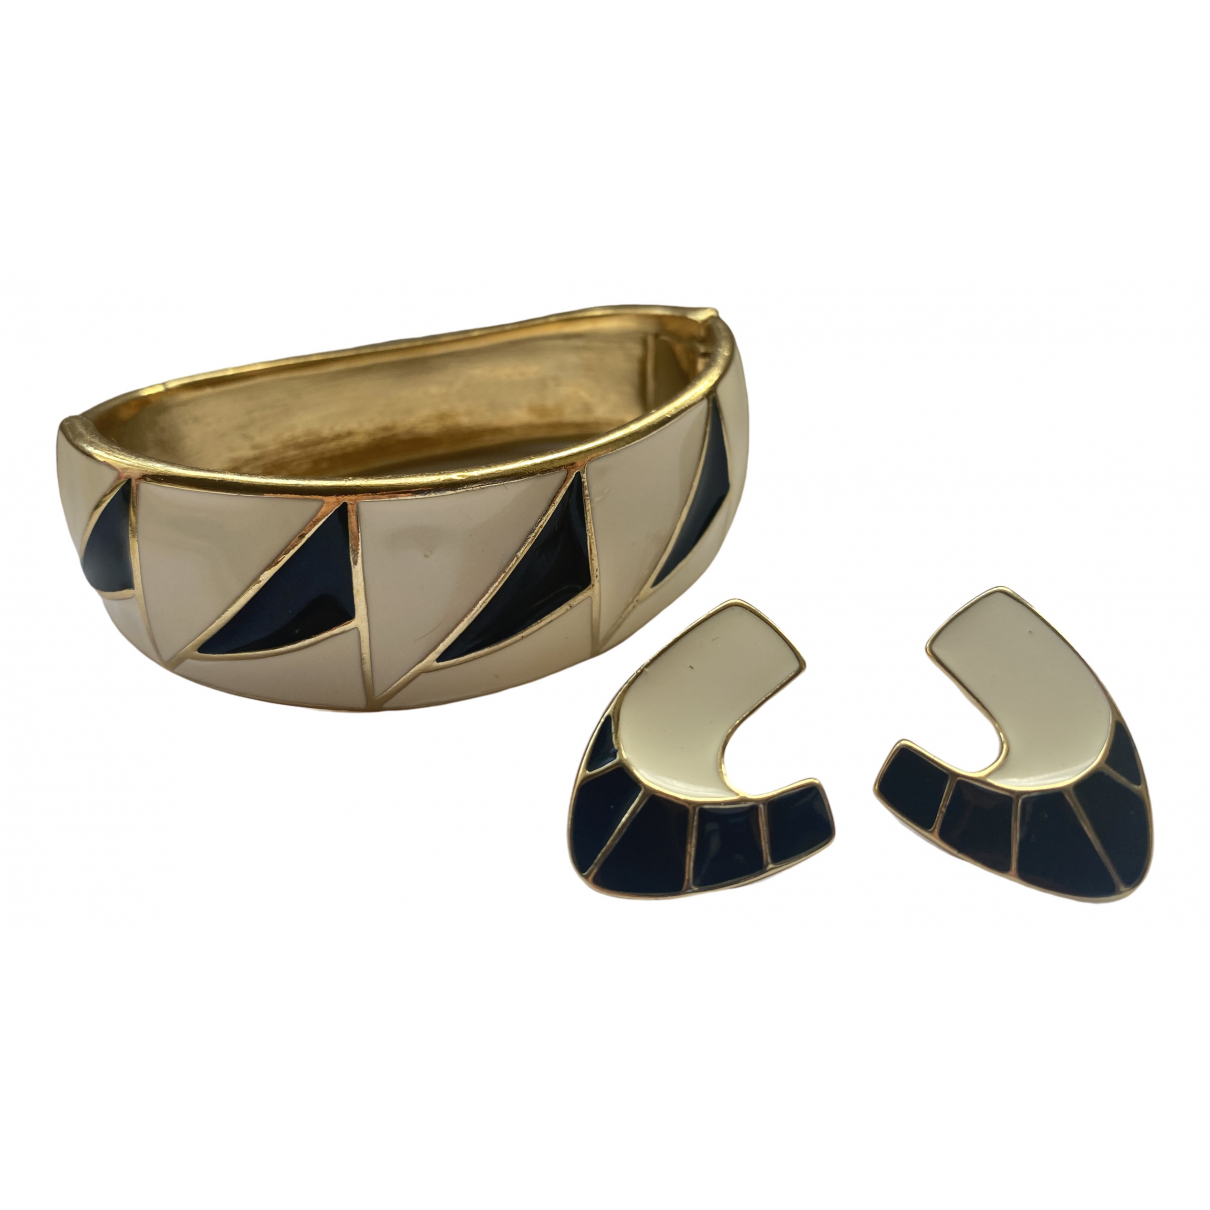 Trifari \N Schmuck-set in  Gold Metall